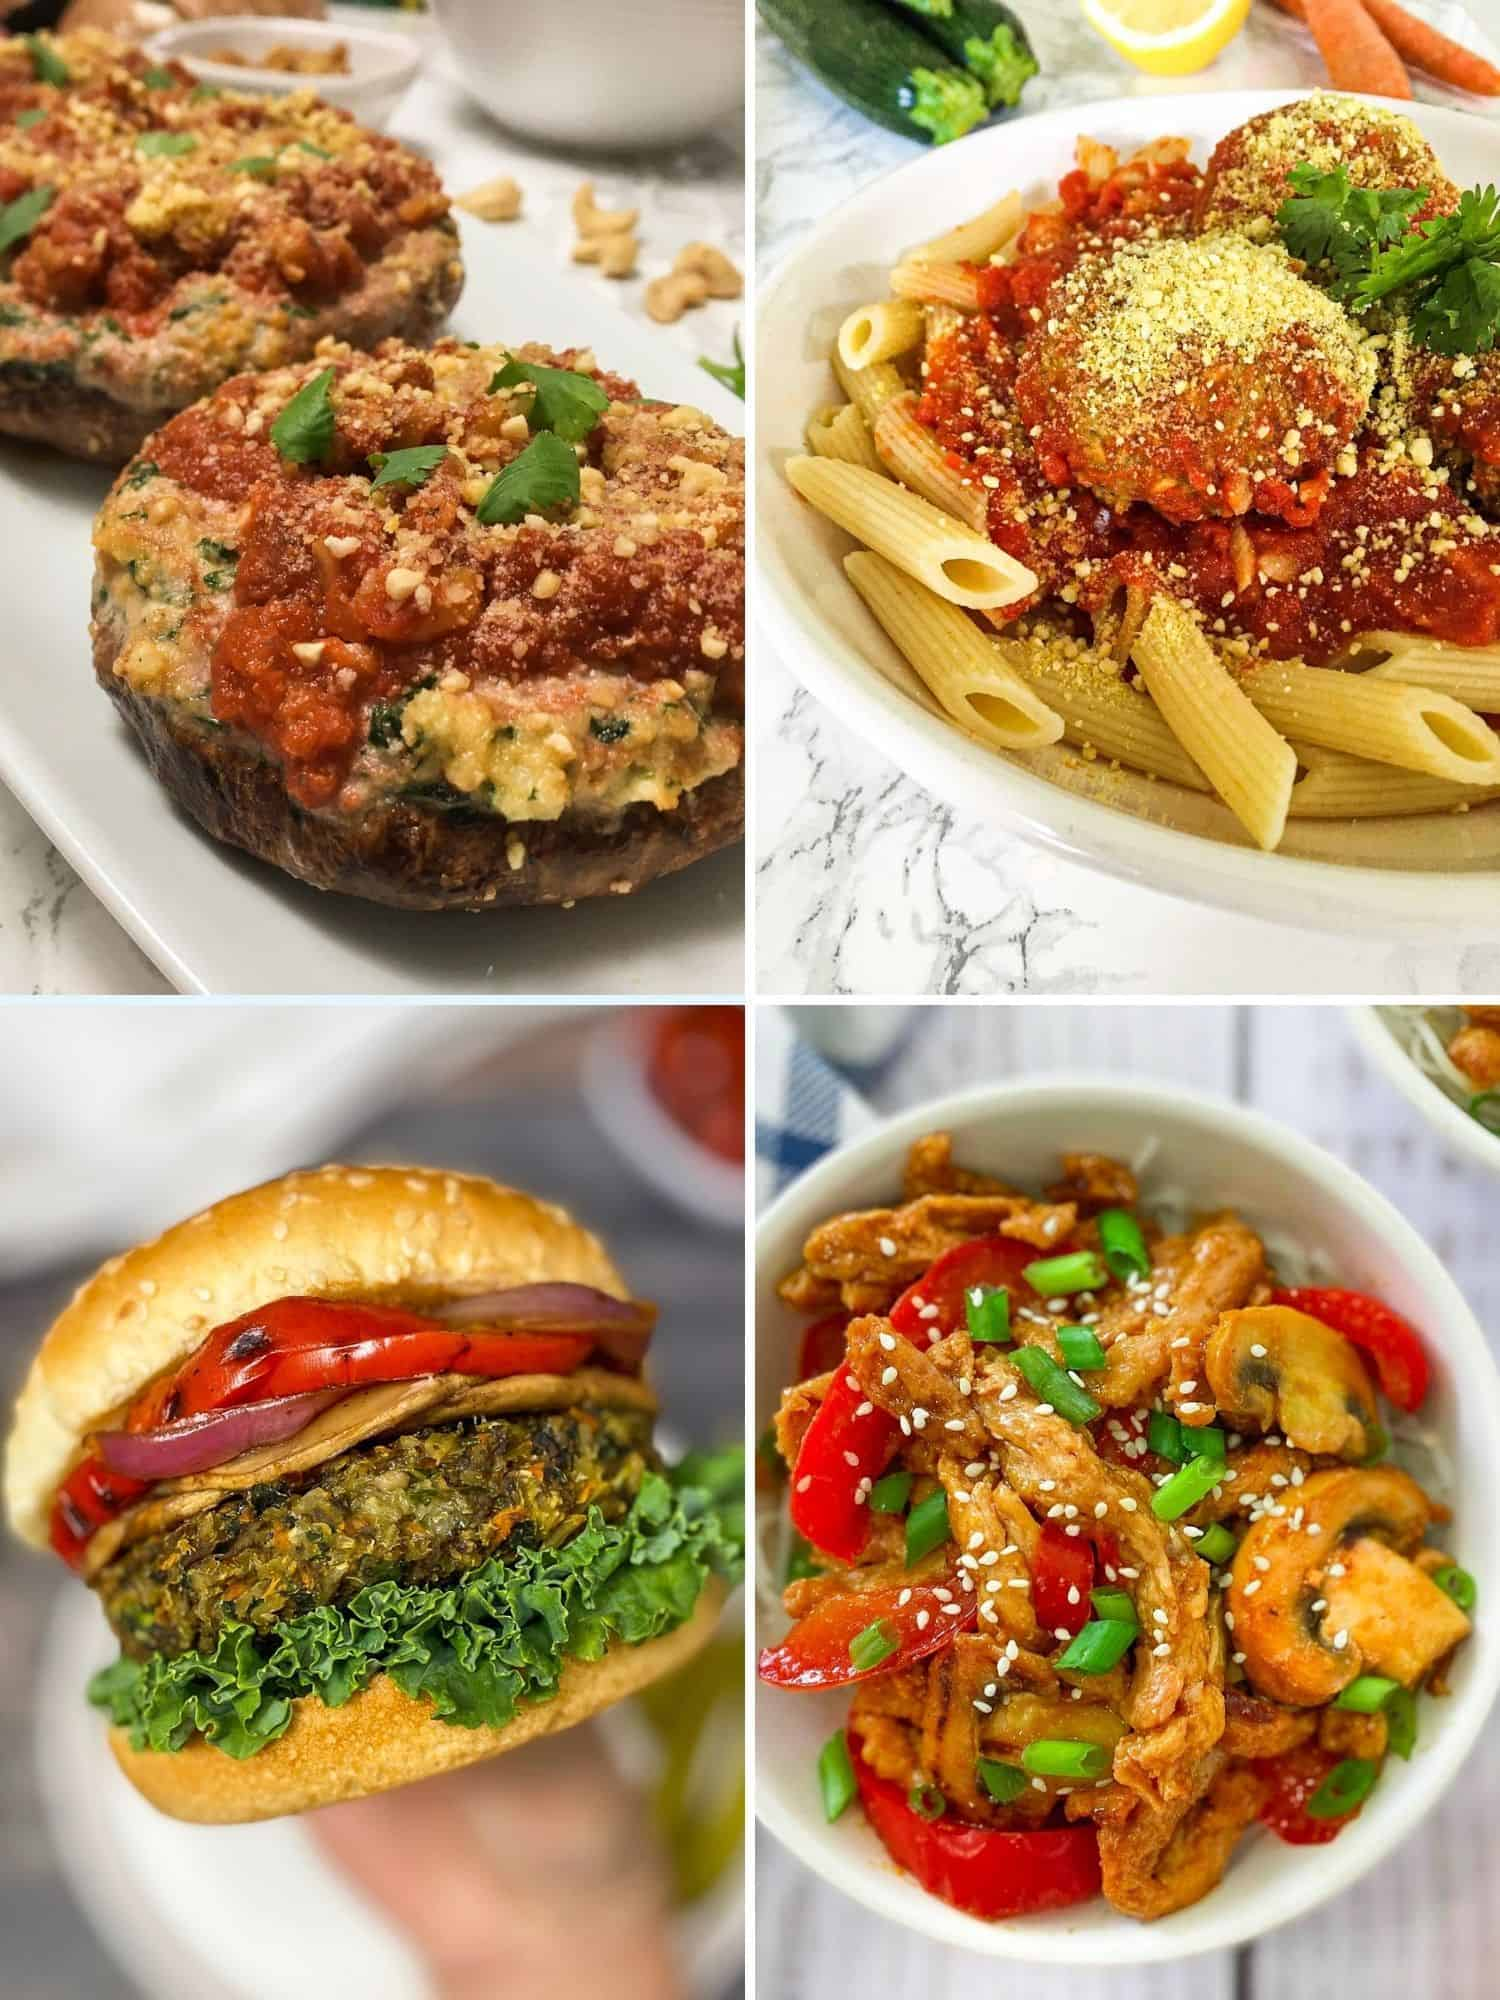 Collage of 4 vegan dinner recipes: stuffed mushrooms, pasta, burger and stir fry.